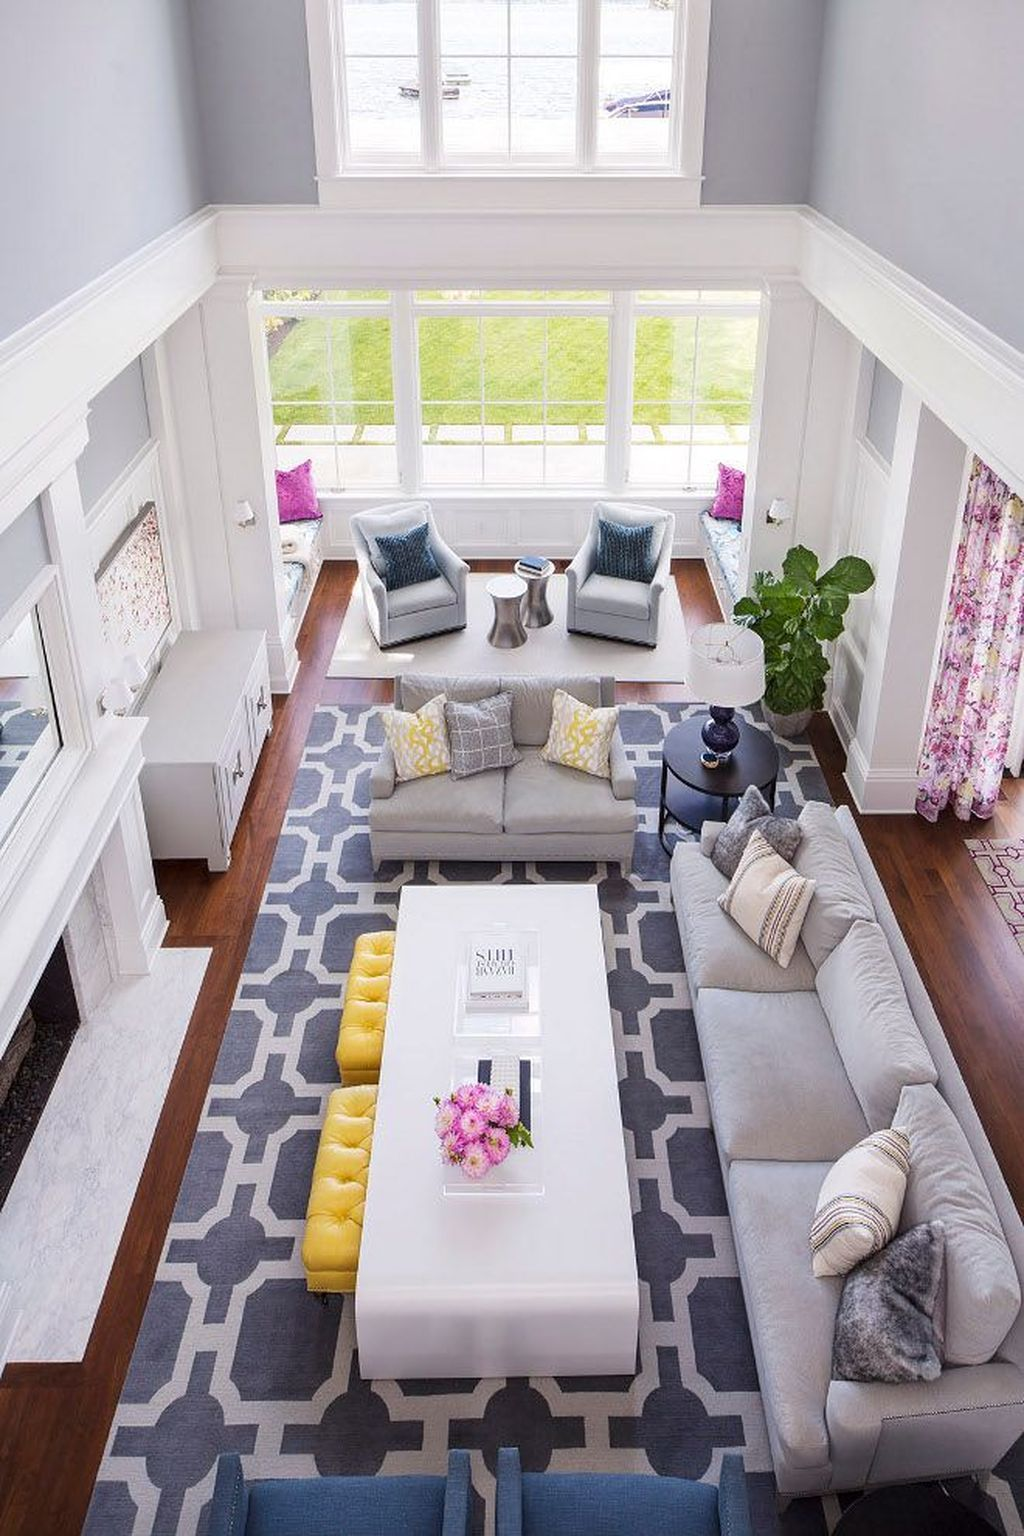 Best Furniture Arrangement Ideas For Your Living Room Decor